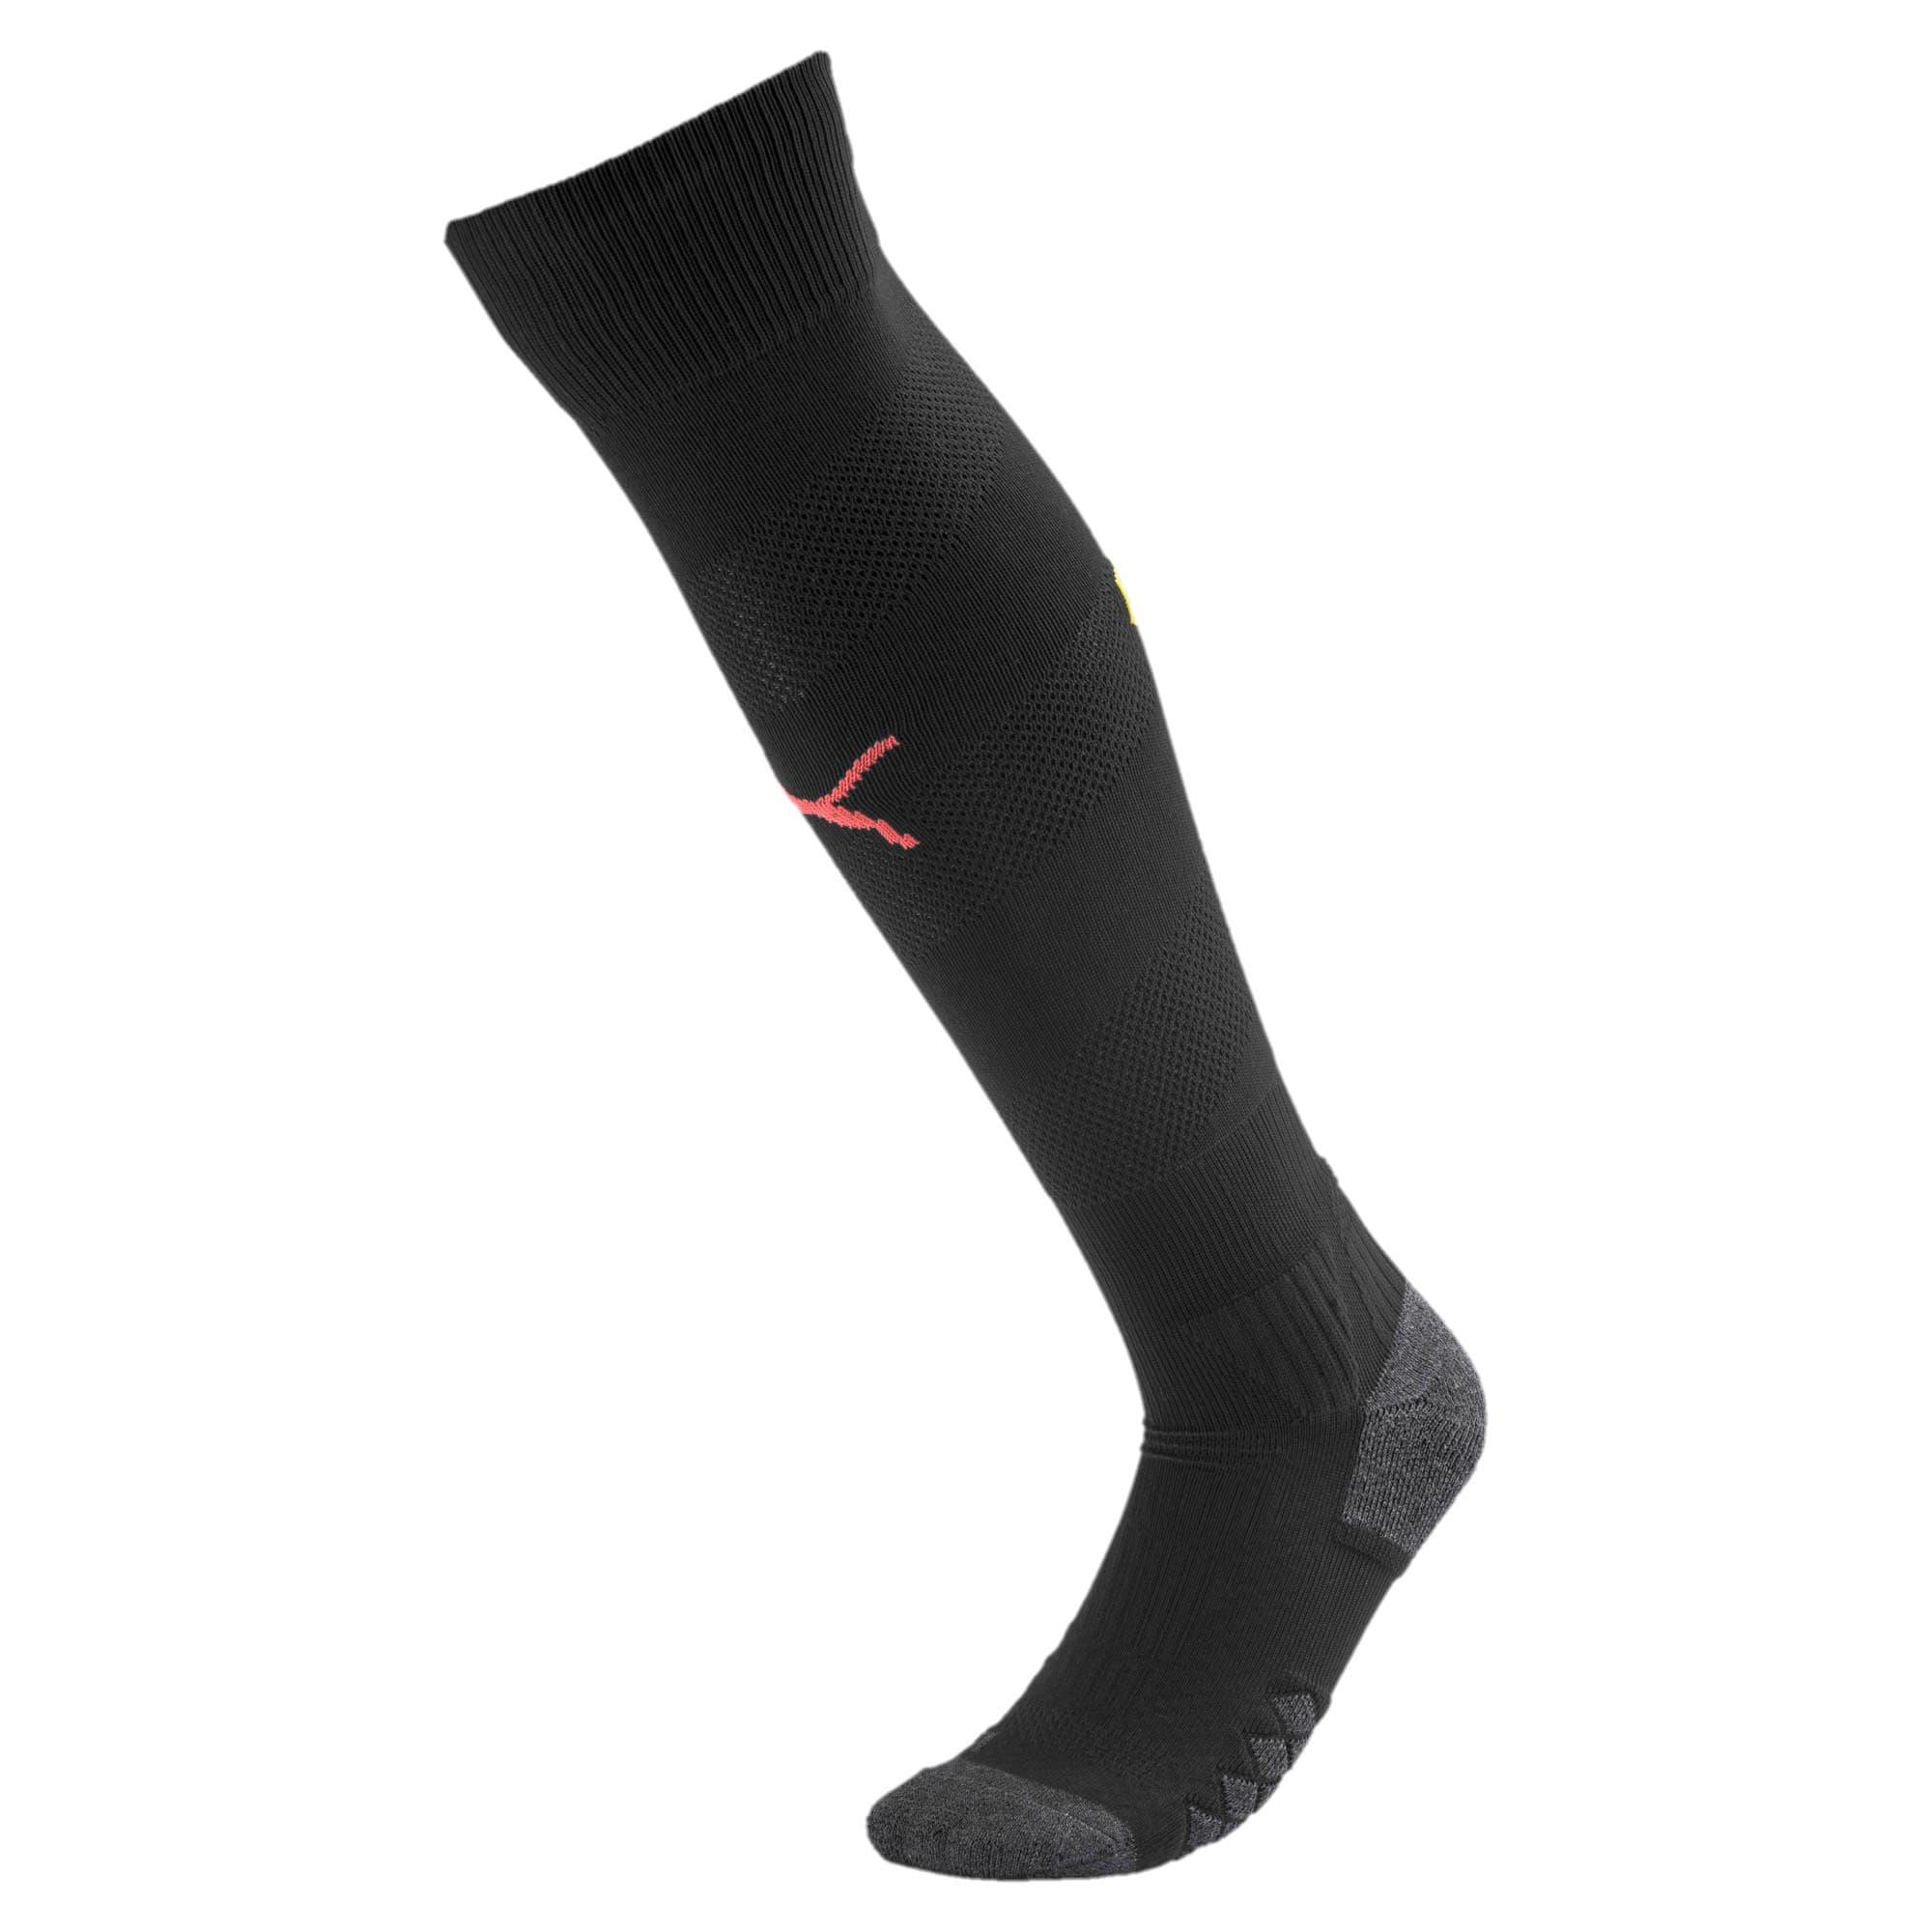 Thumbnail 1 of Man City Spiral Men's Socks, Puma Black-Georgia Peach, medium